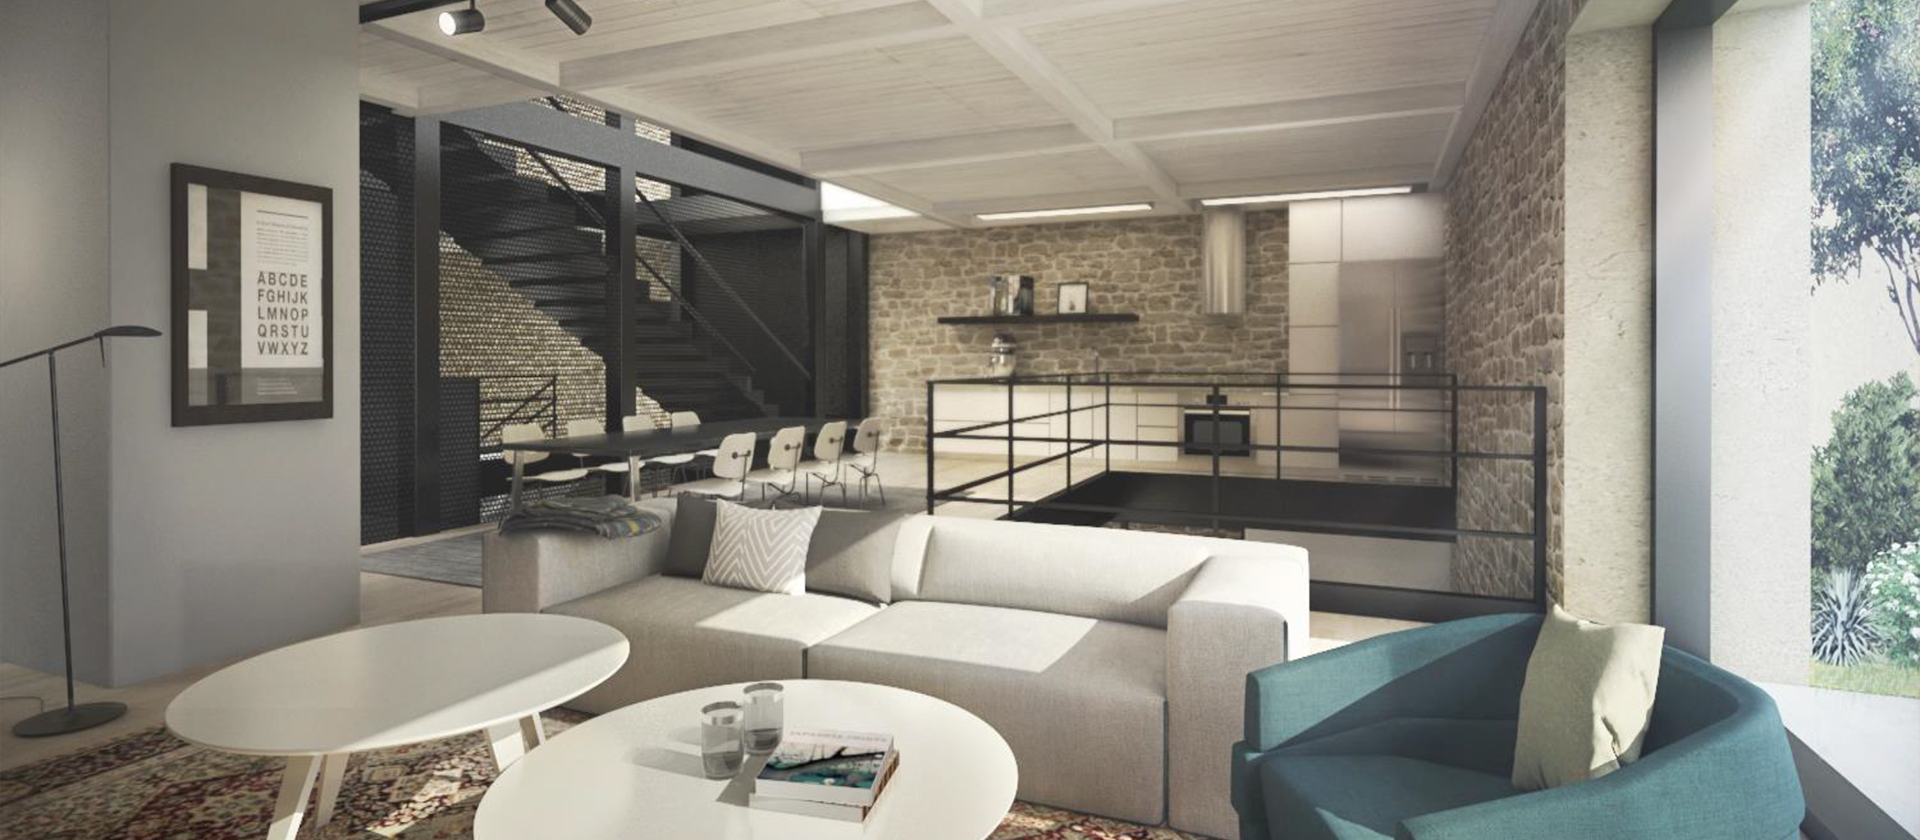 Design Interior fidi italy interior design in florence design